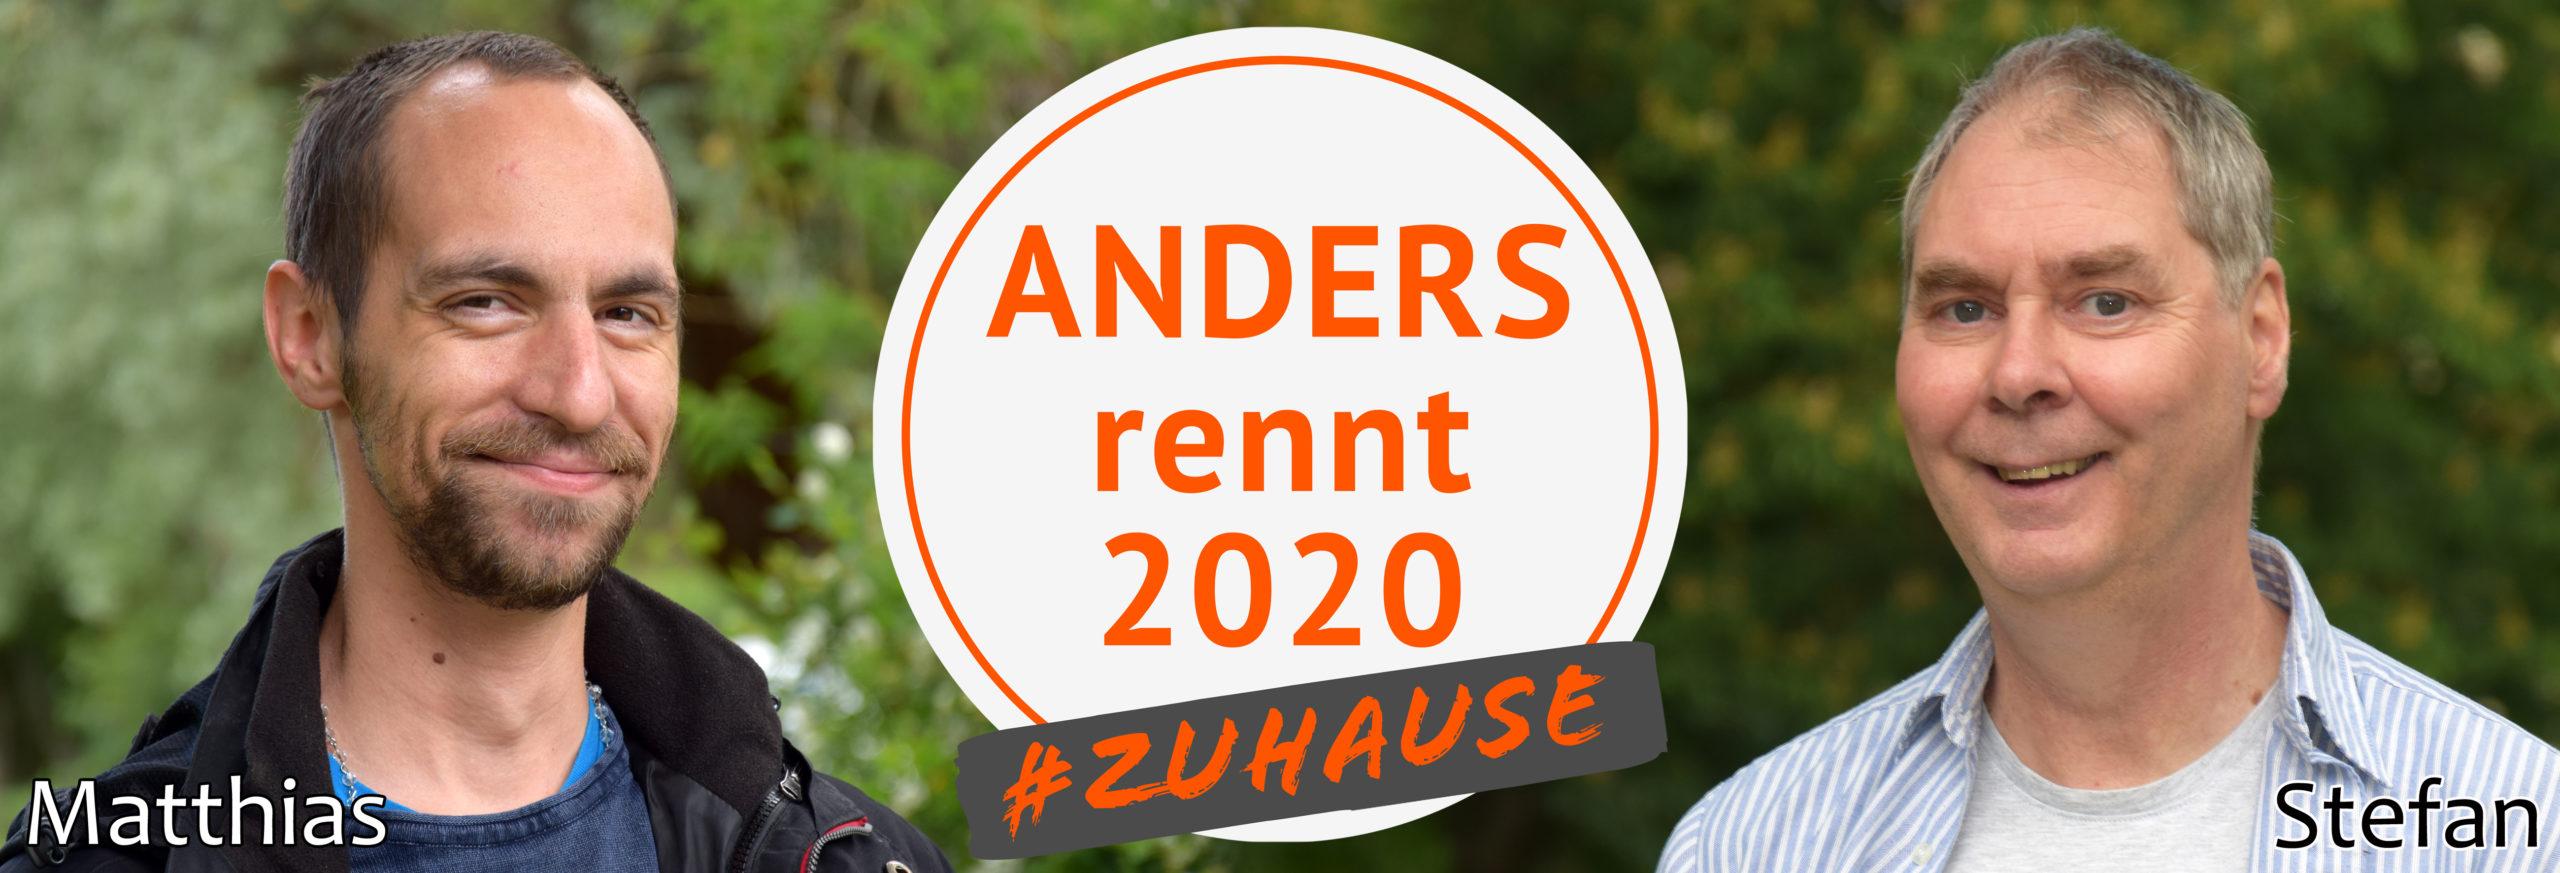 ANDERS rennt 2020 - Matthias & Stefan